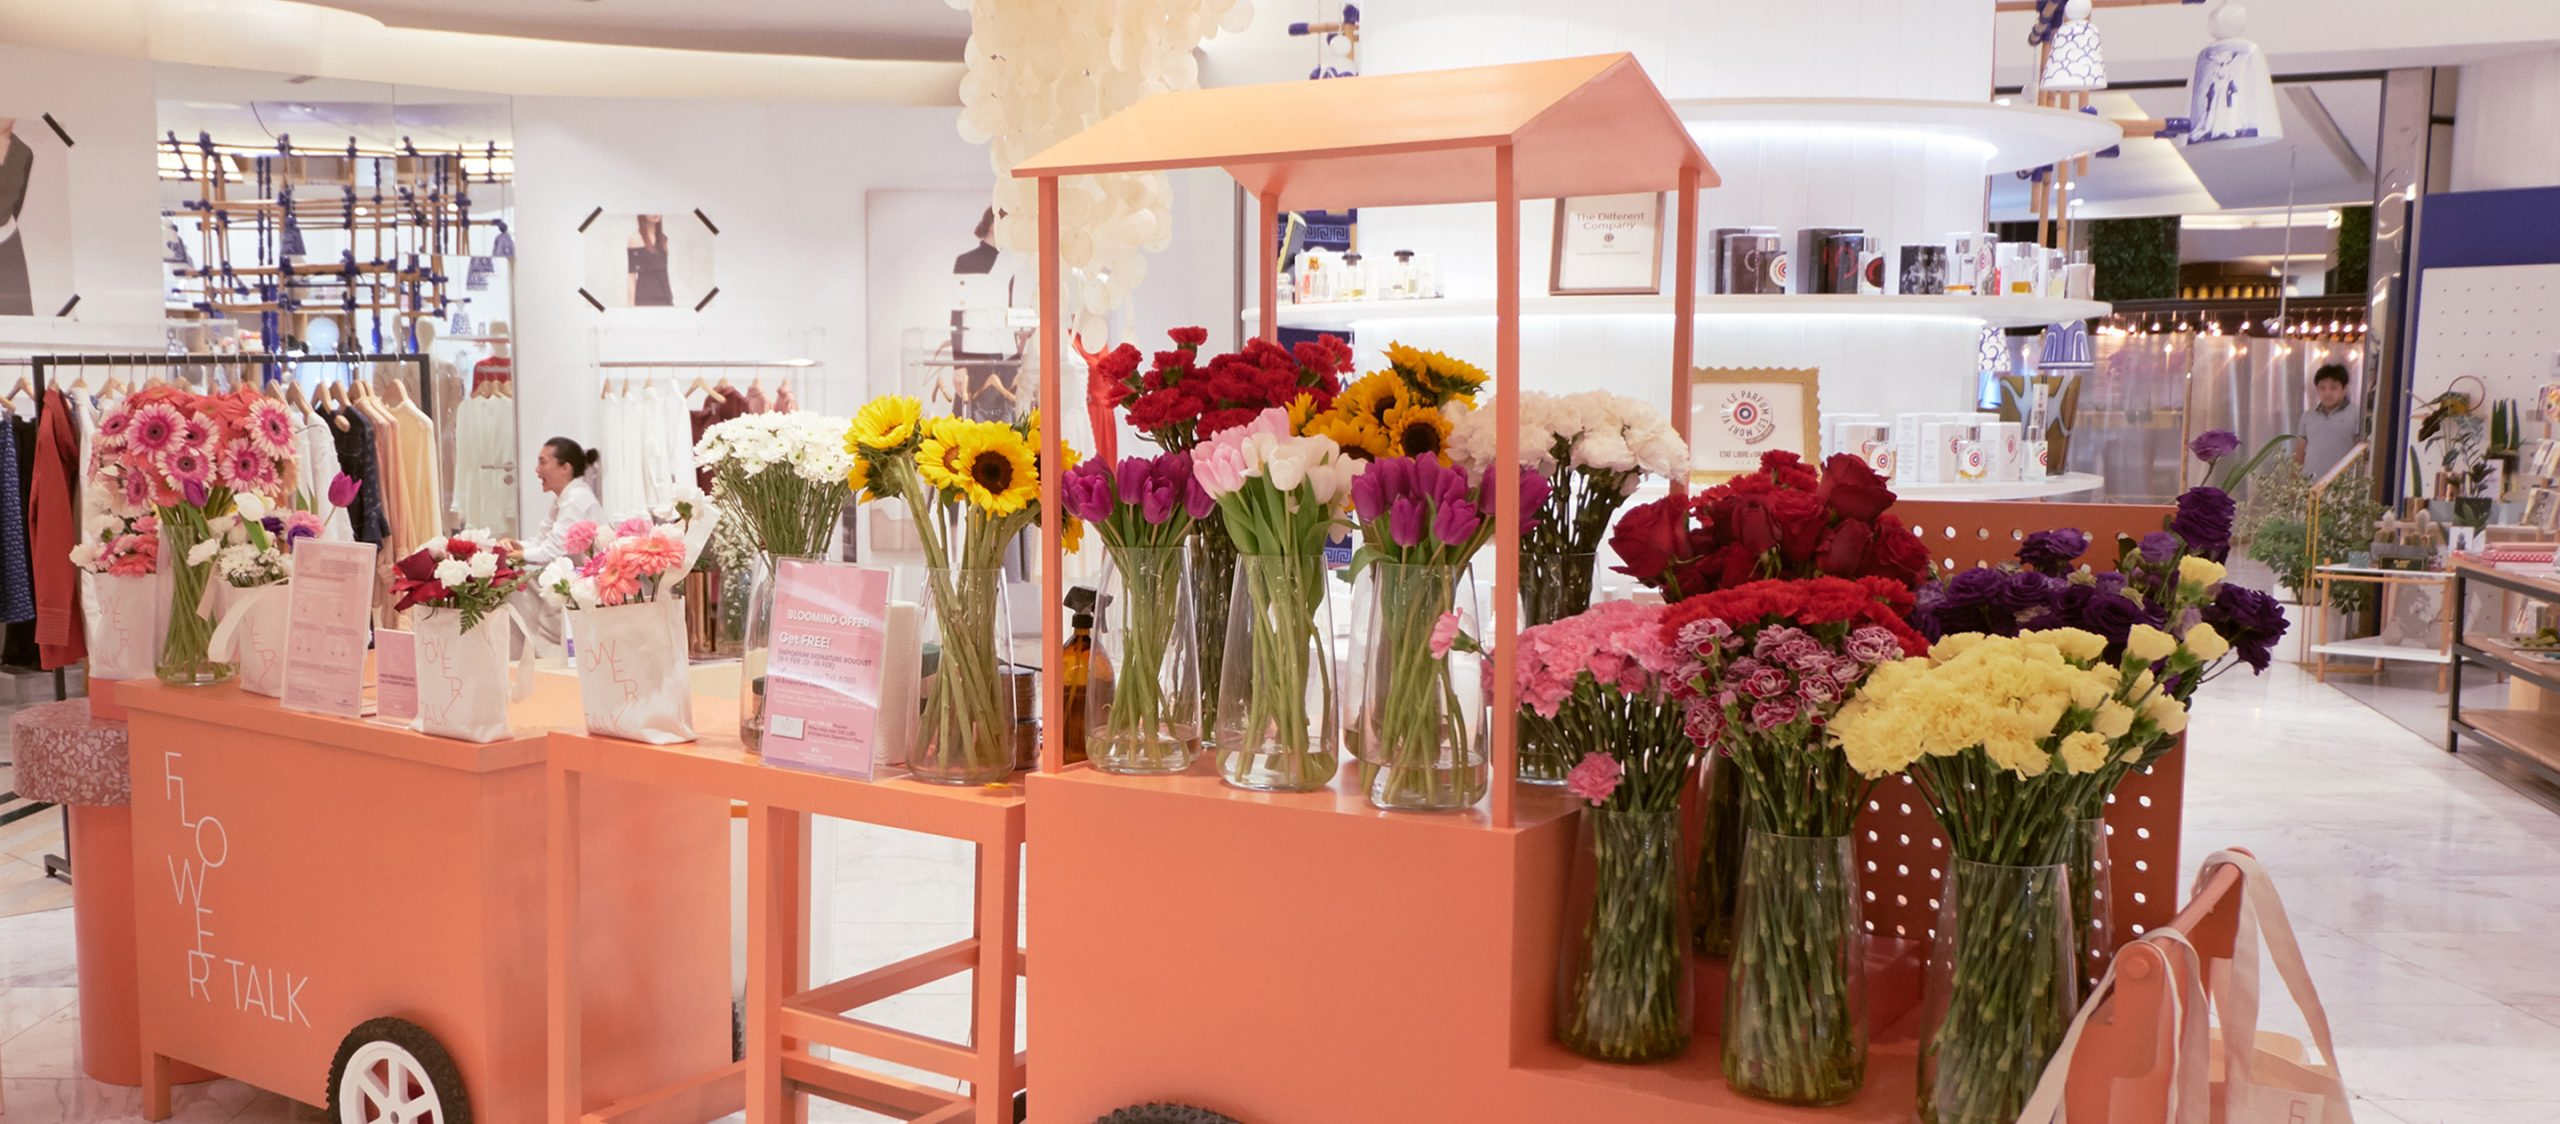 'My heart feels, my flower says.' ให้ดอกไม้เอื้อนเอ่ยวาจาภาษารักในเทศกาลวาเลนไทน์กับแคมเปญ Flower Talk